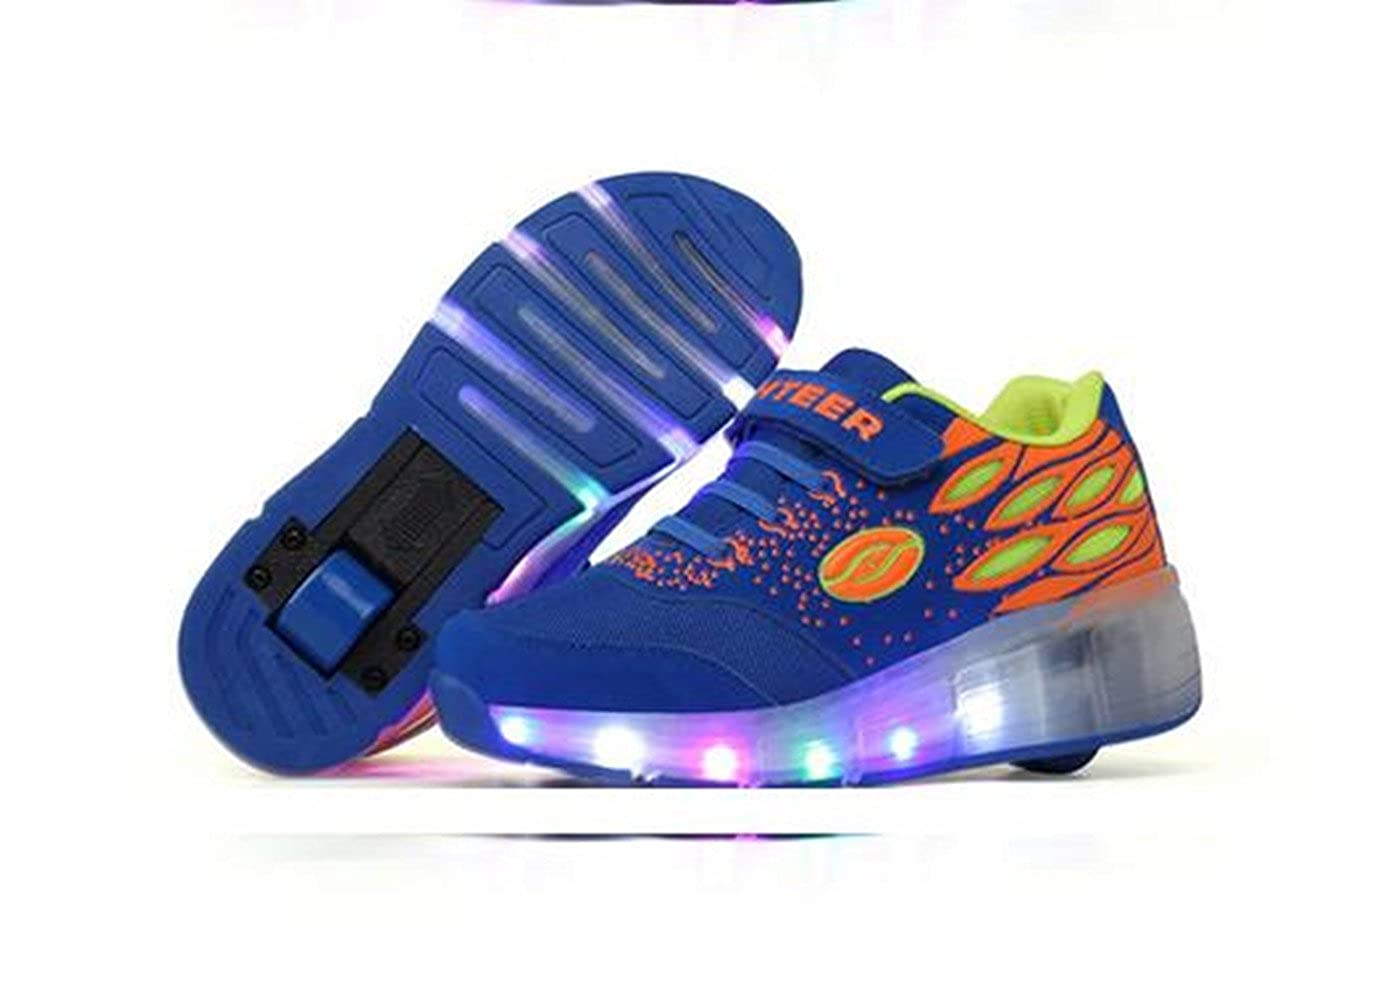 A4CIASJjs Kids LED Shoes Light Up Wheels Roller Skates Flashing Fashion Sneakers